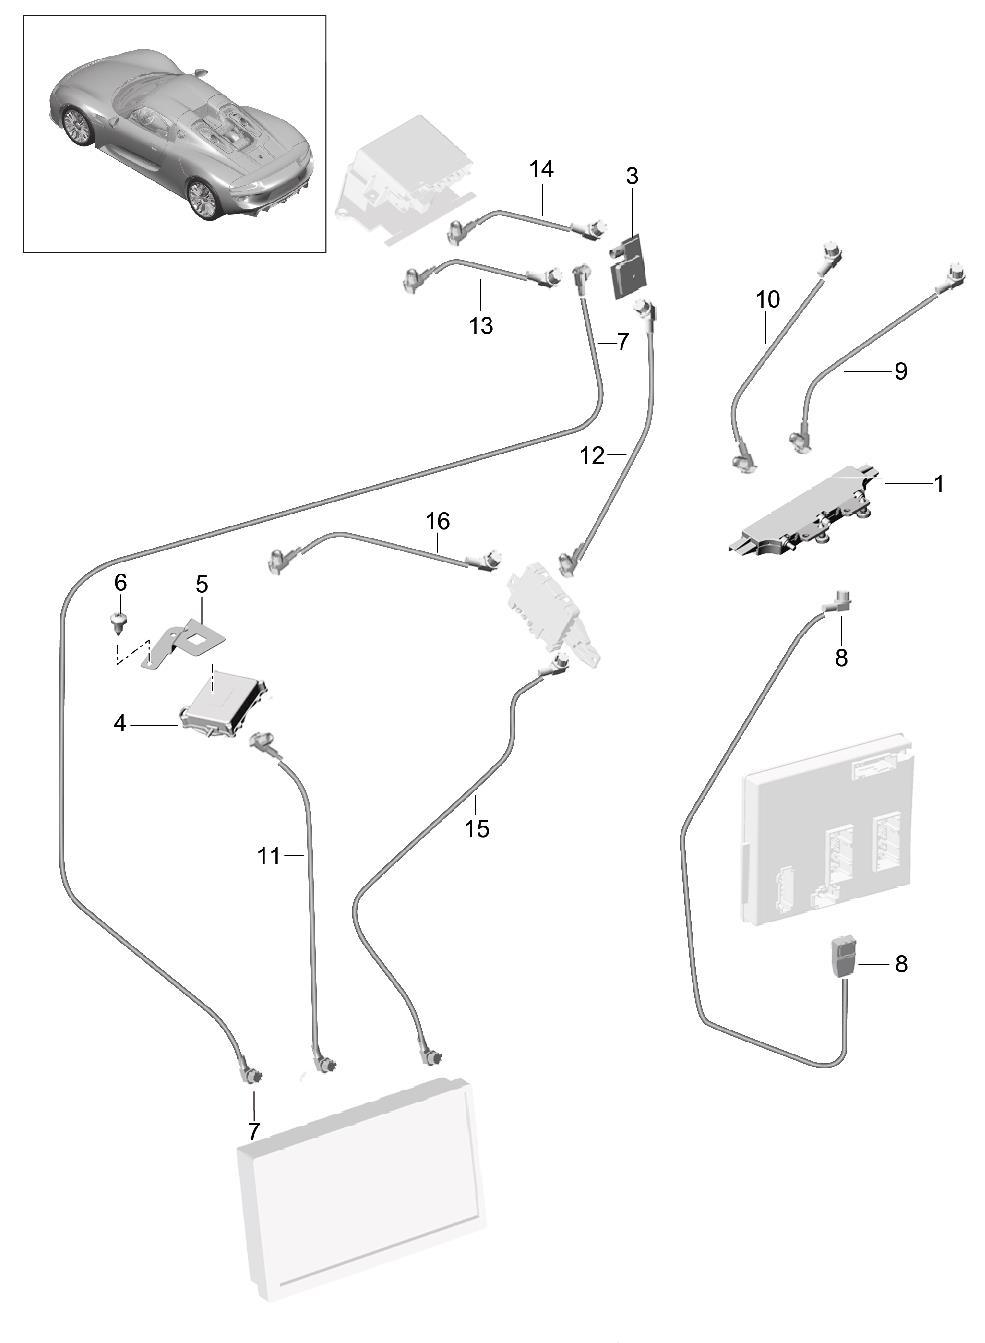 Porsche 918 Spyder Support single pole roof connection